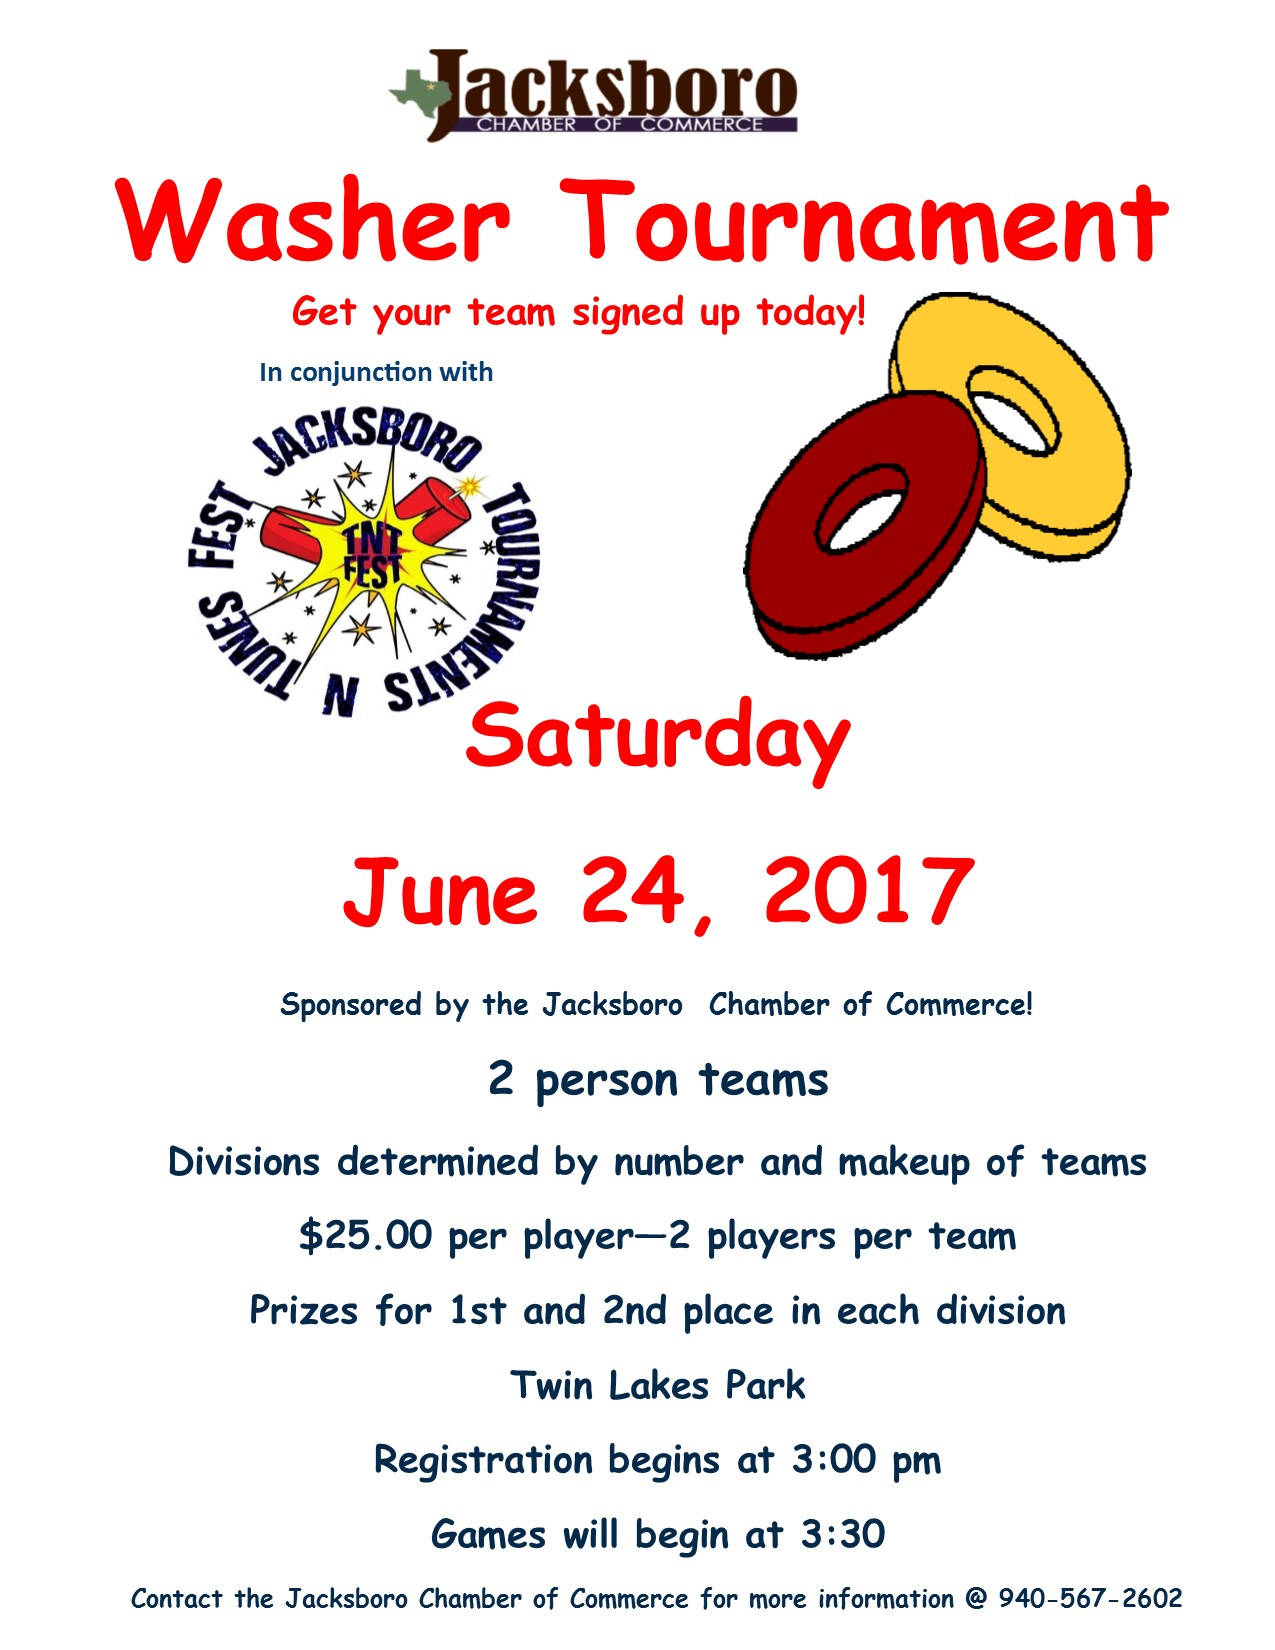 Washer-Tournament.jpg